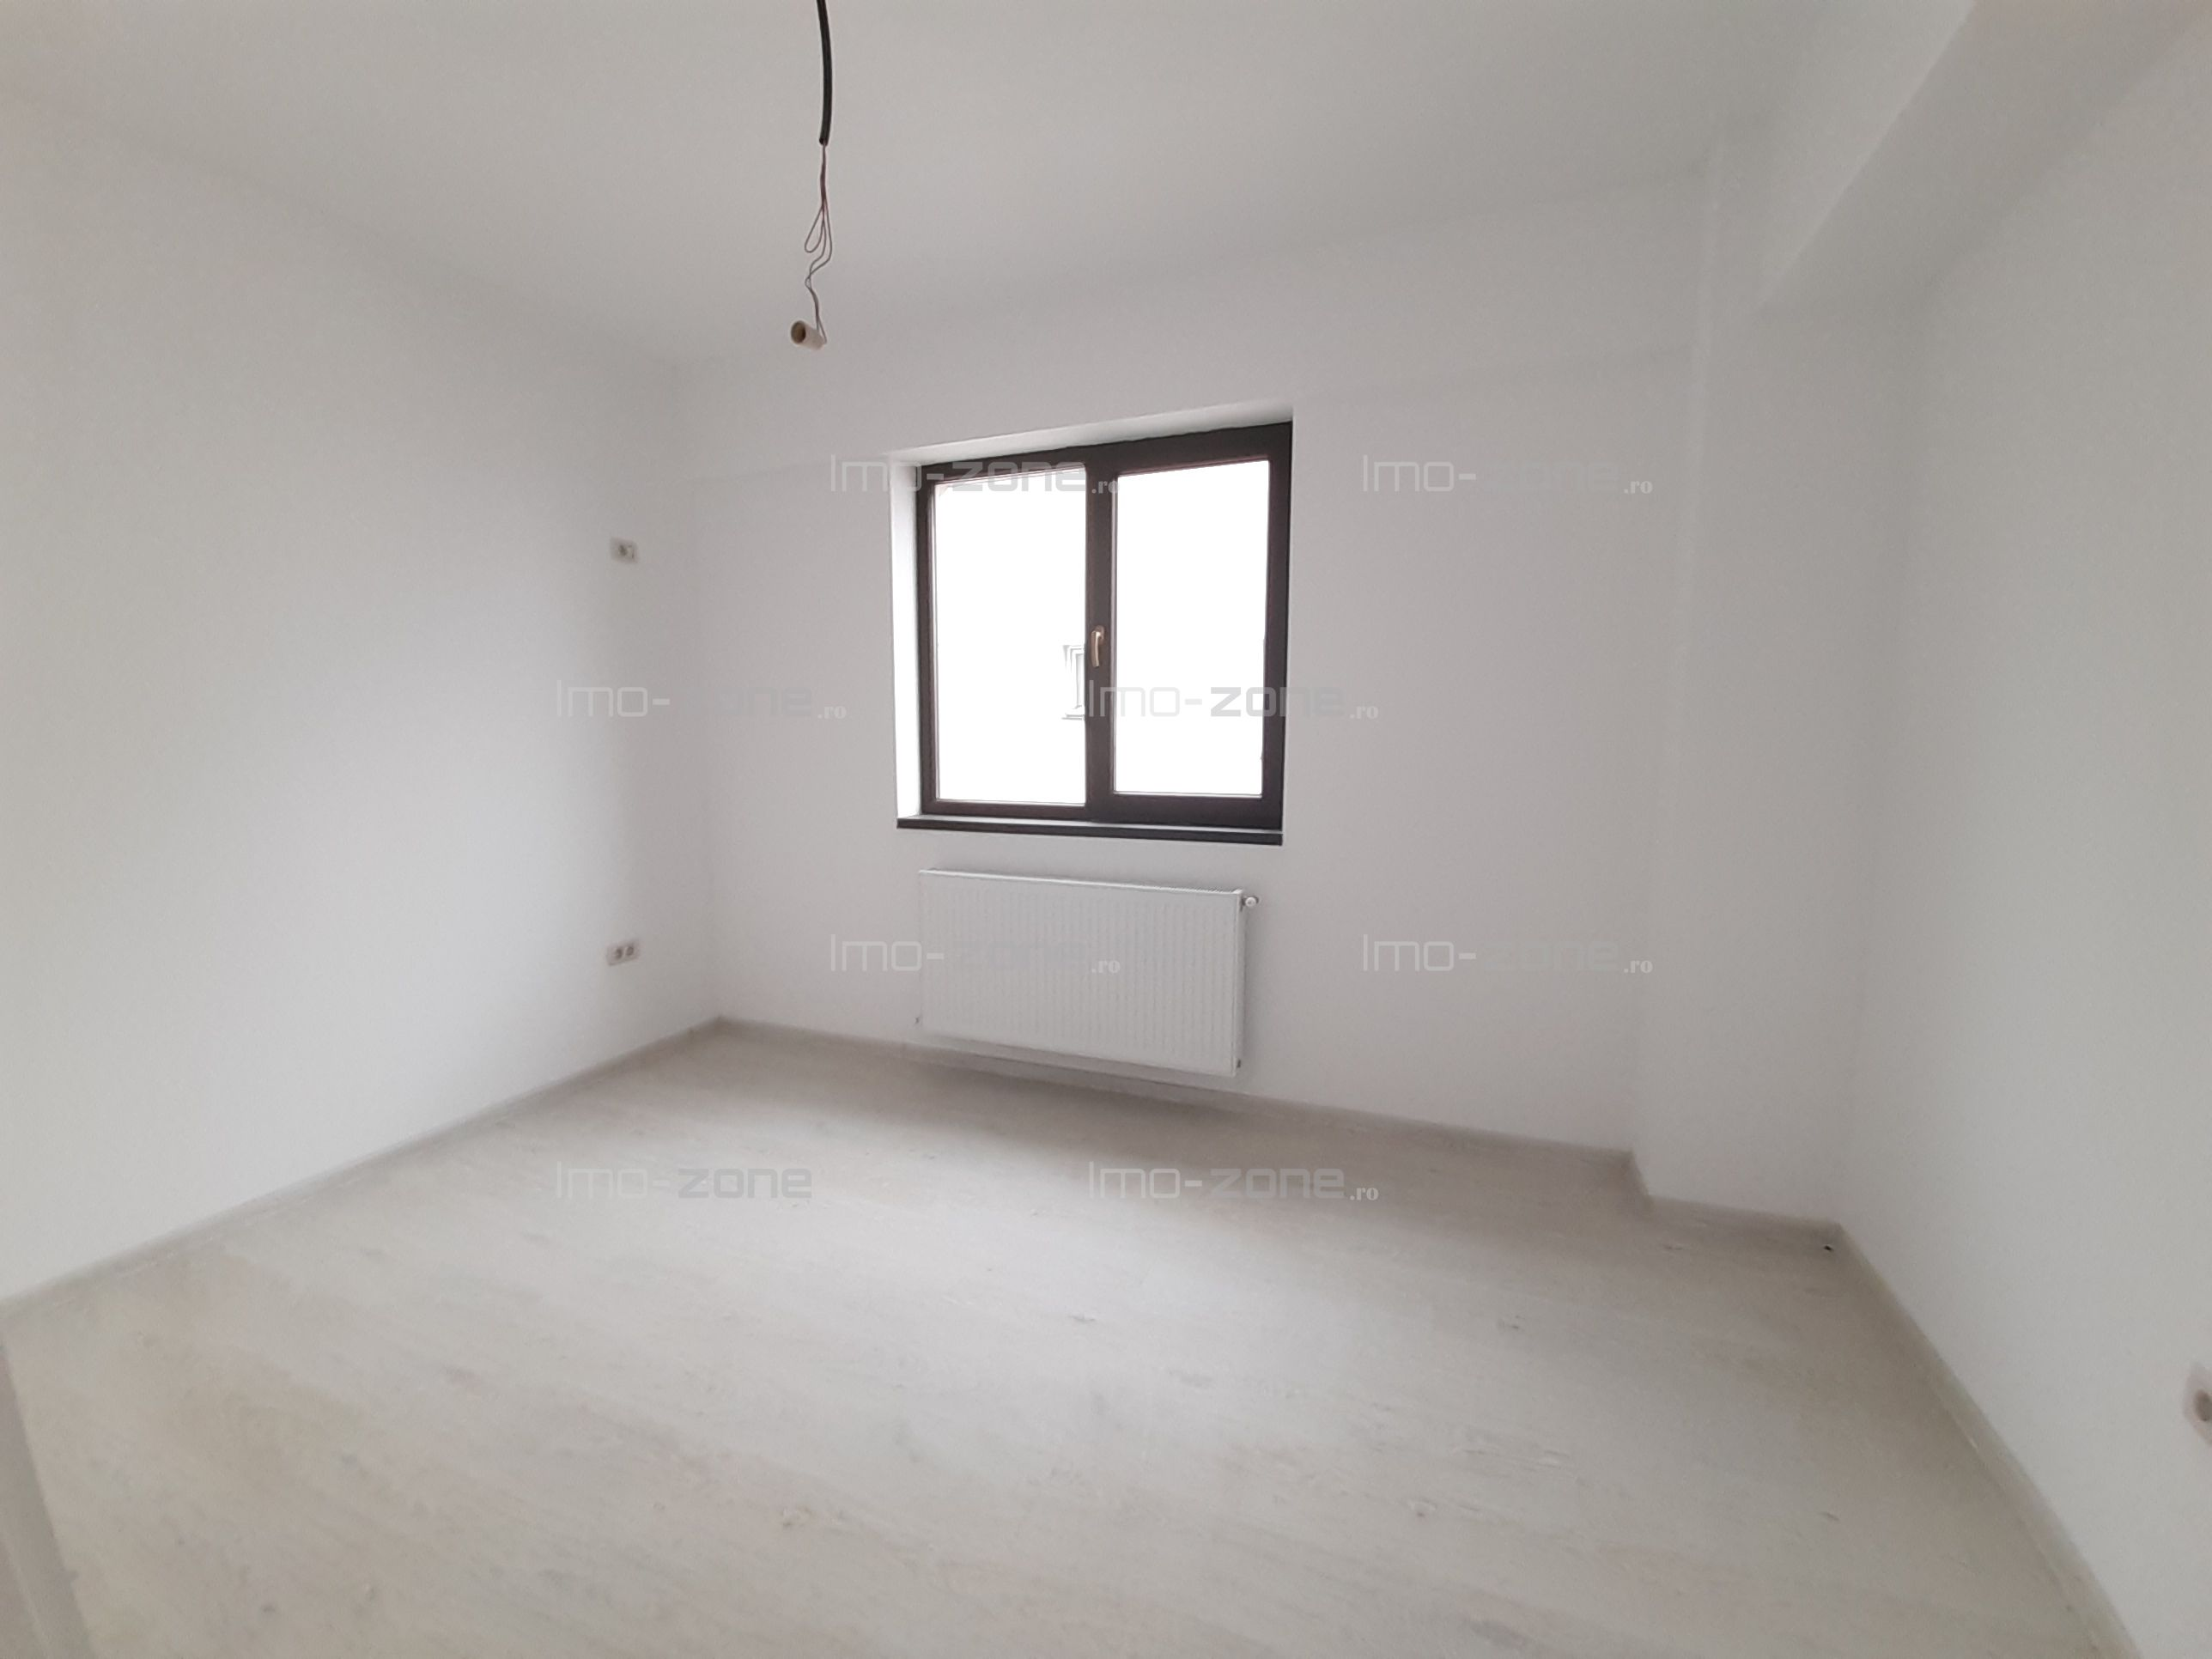 Apartament 3 camere, 109 mp(terasa 42 mp), Drumul Taberei, sector 5, finalizat